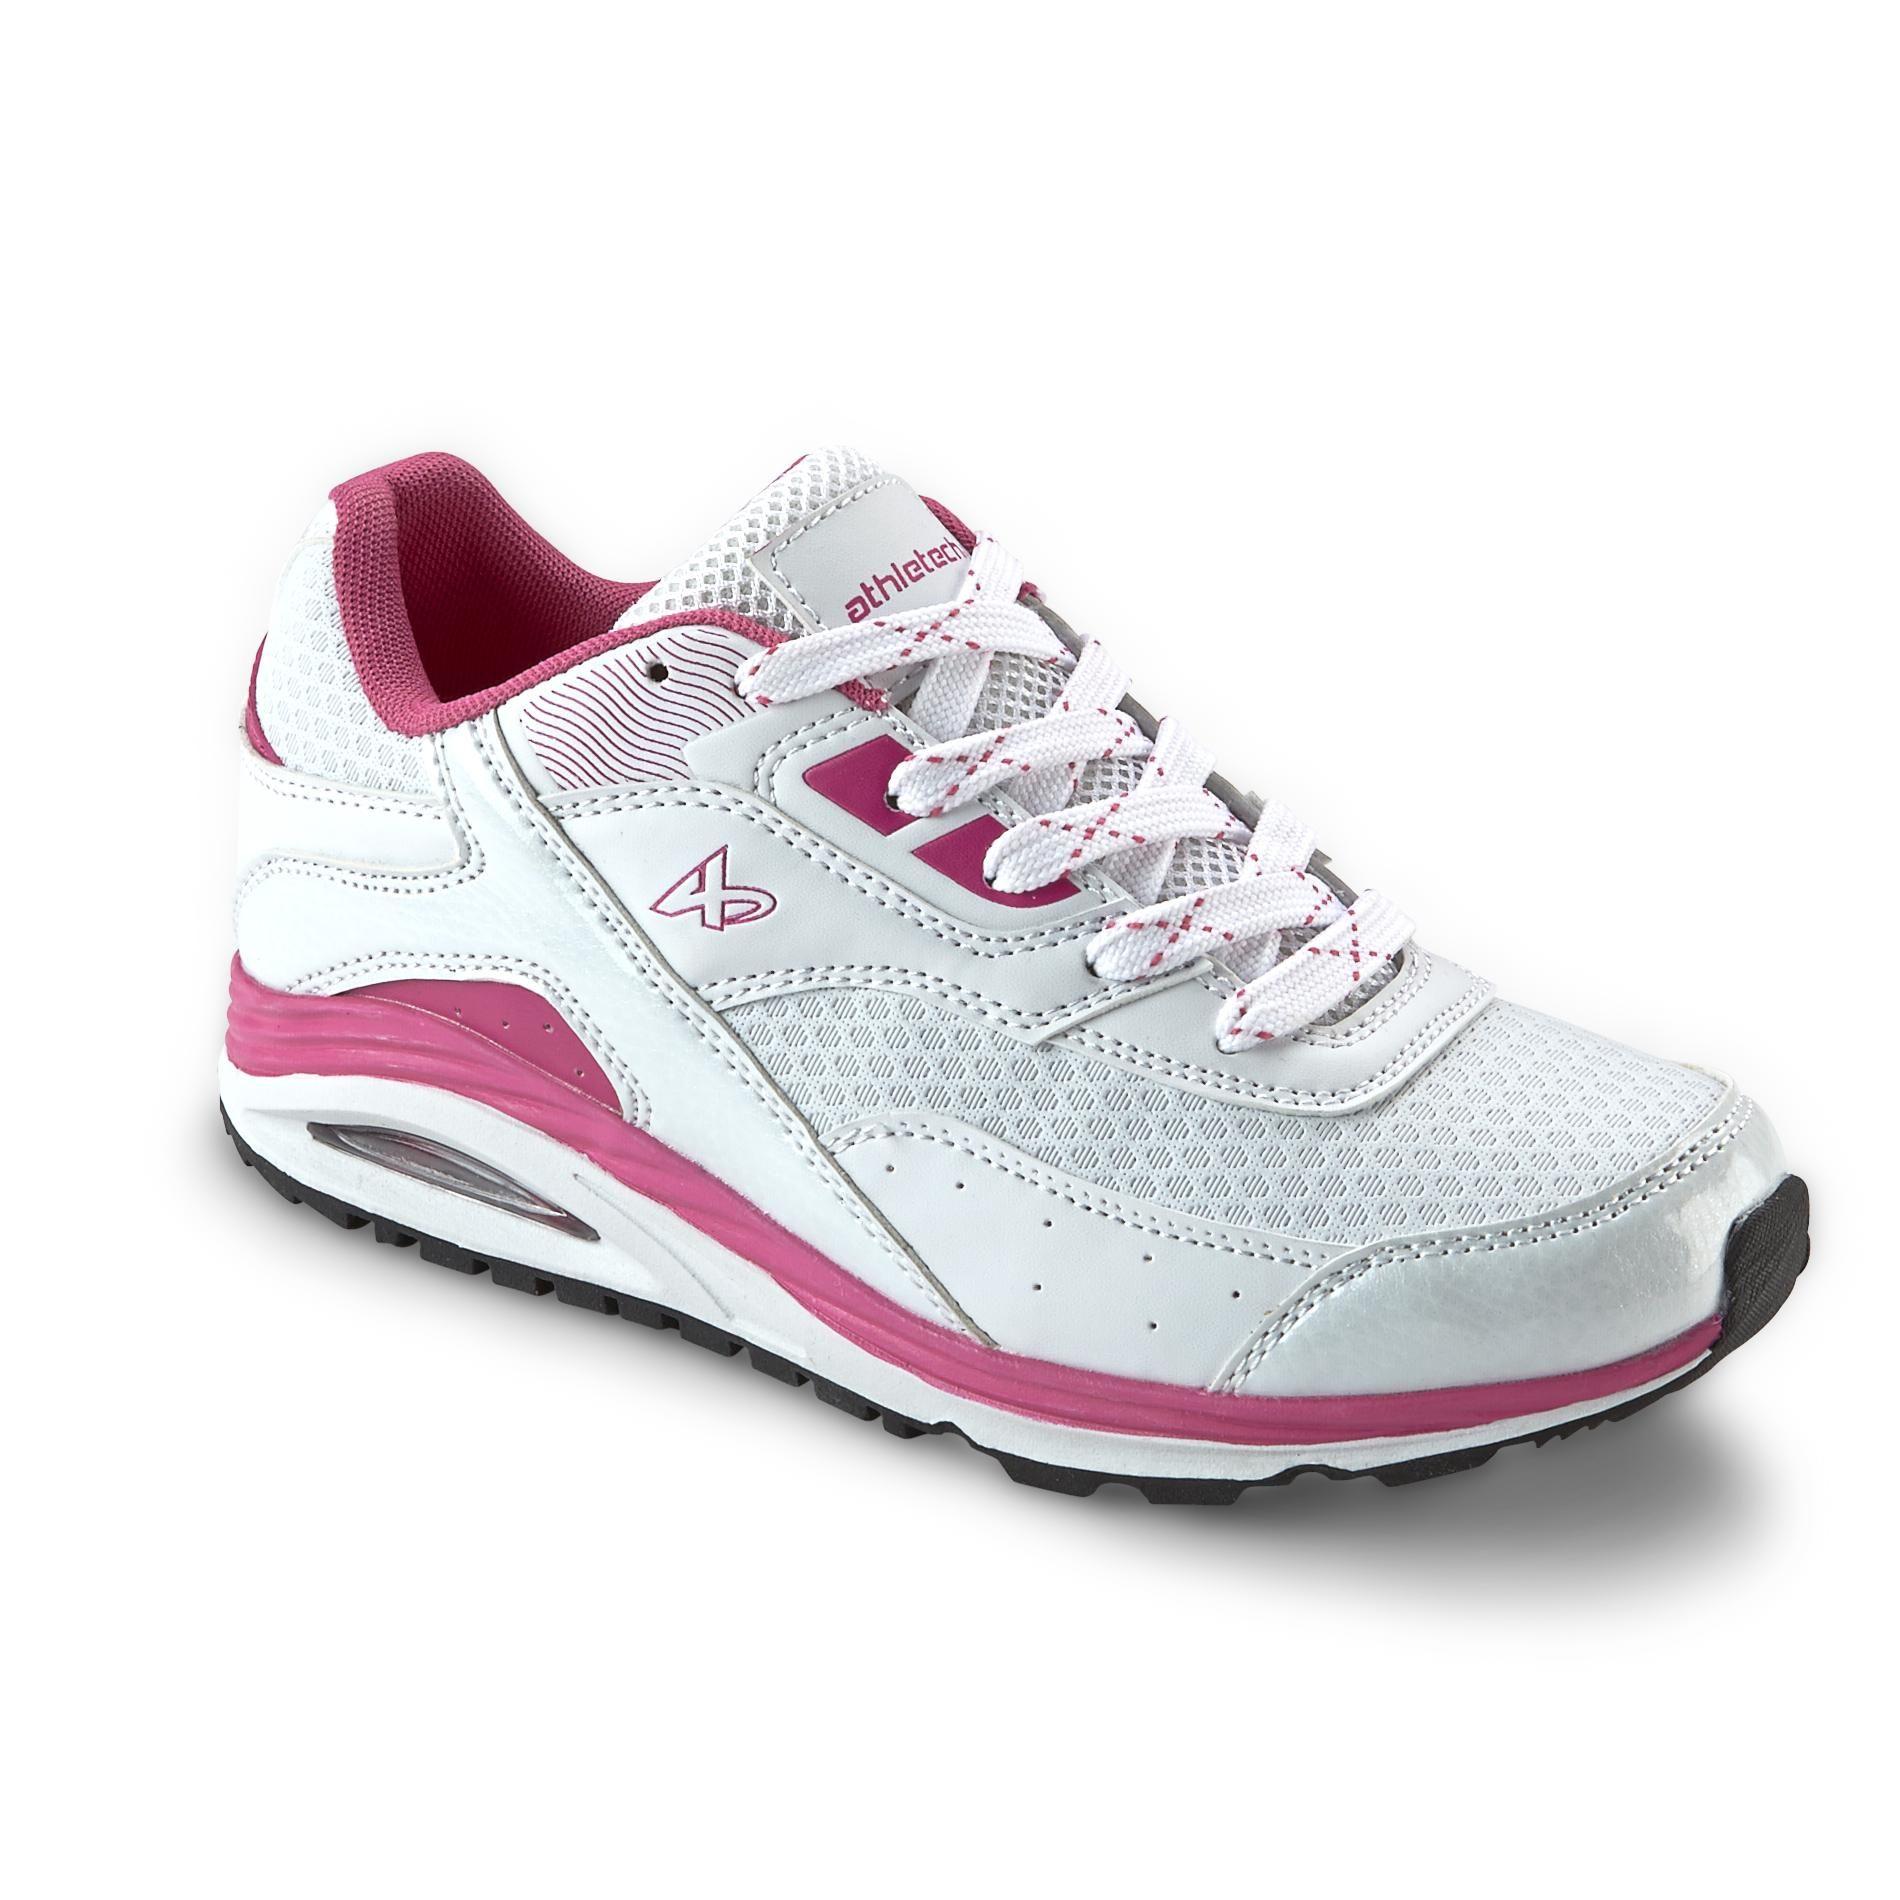 Bobby White/Pink Athletic Shoe